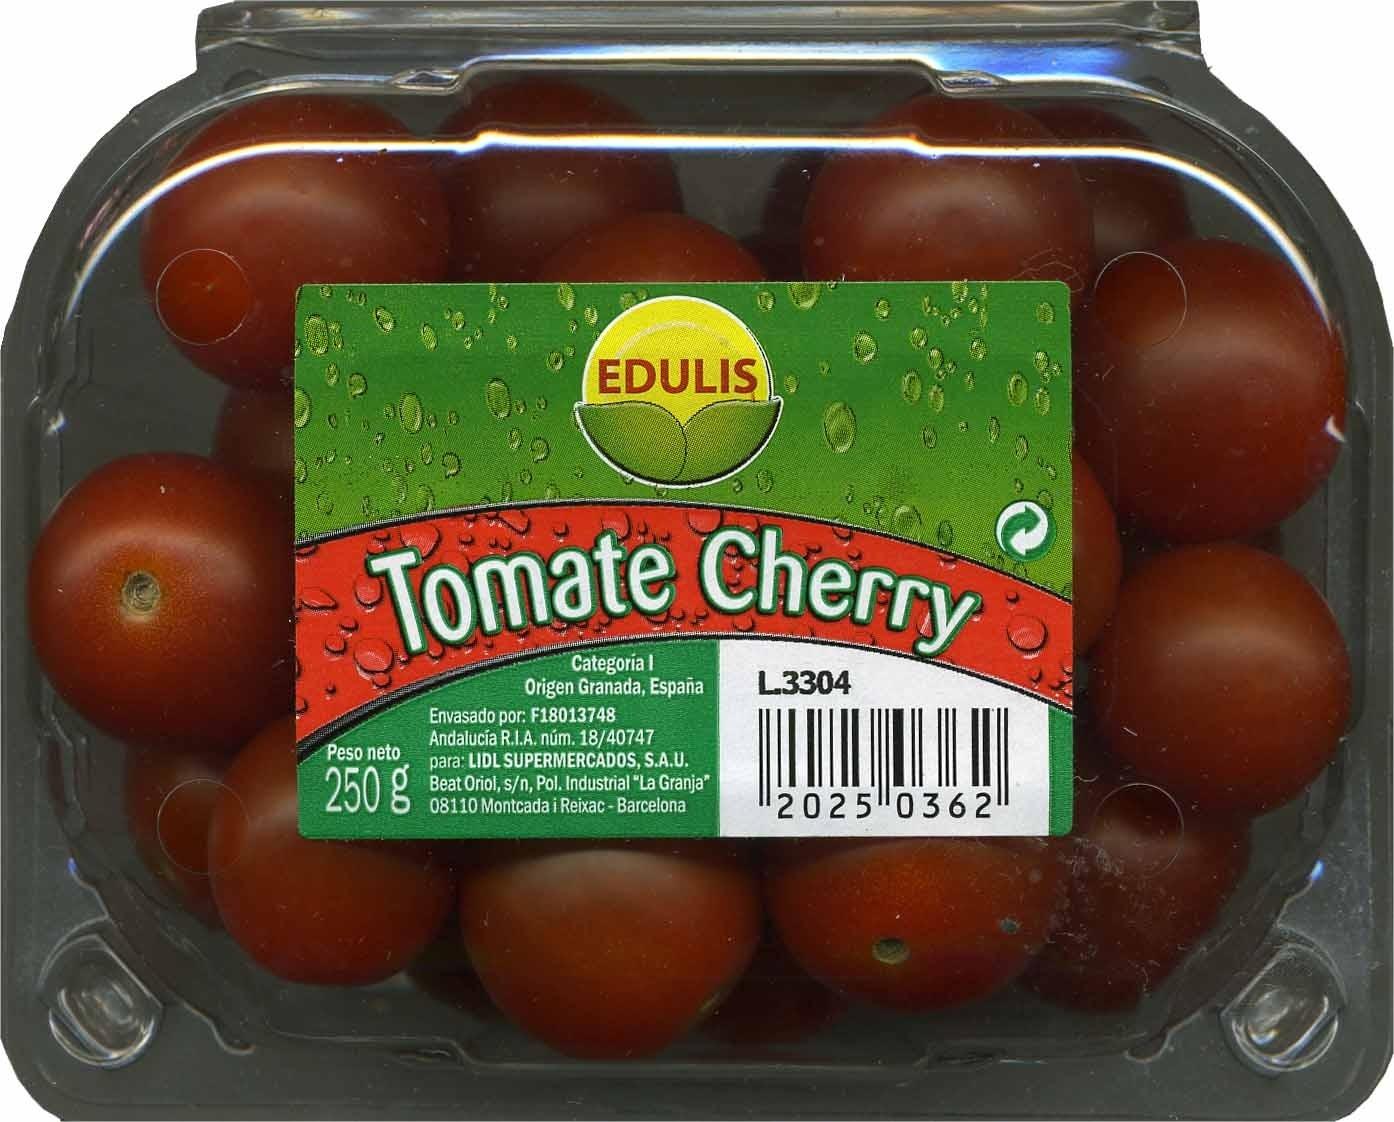 Tomates cherry - Producto - es